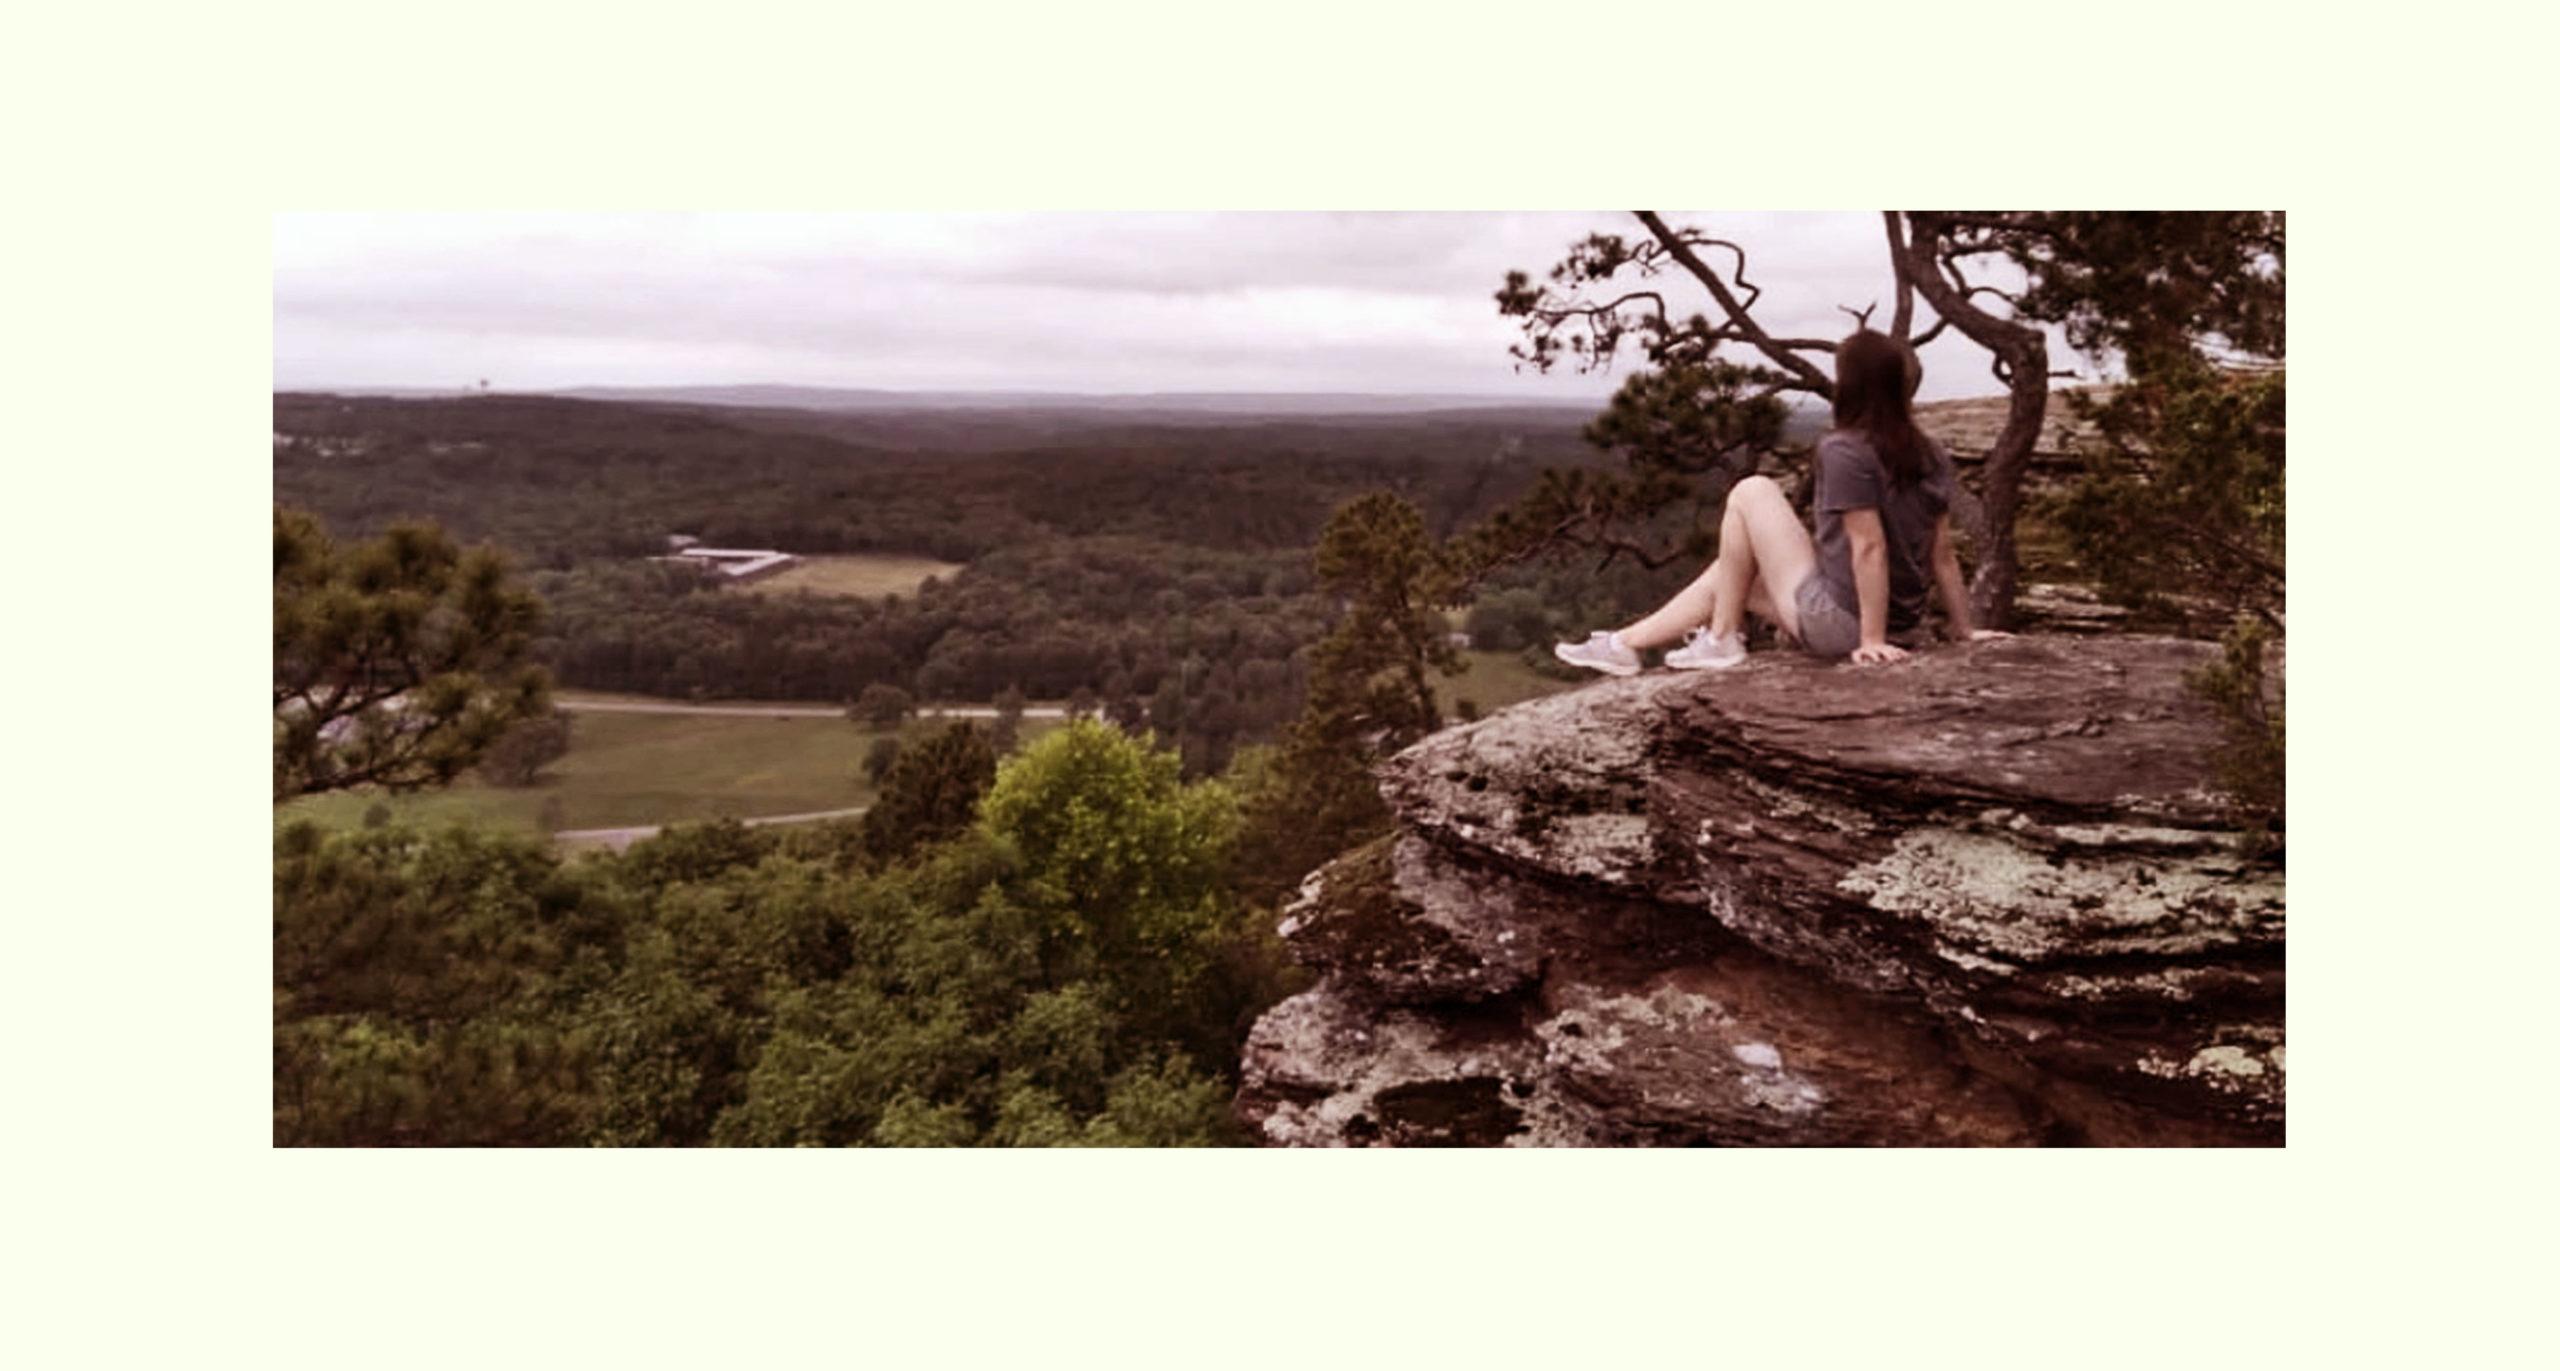 Arkansas Stories: Hope and Healing